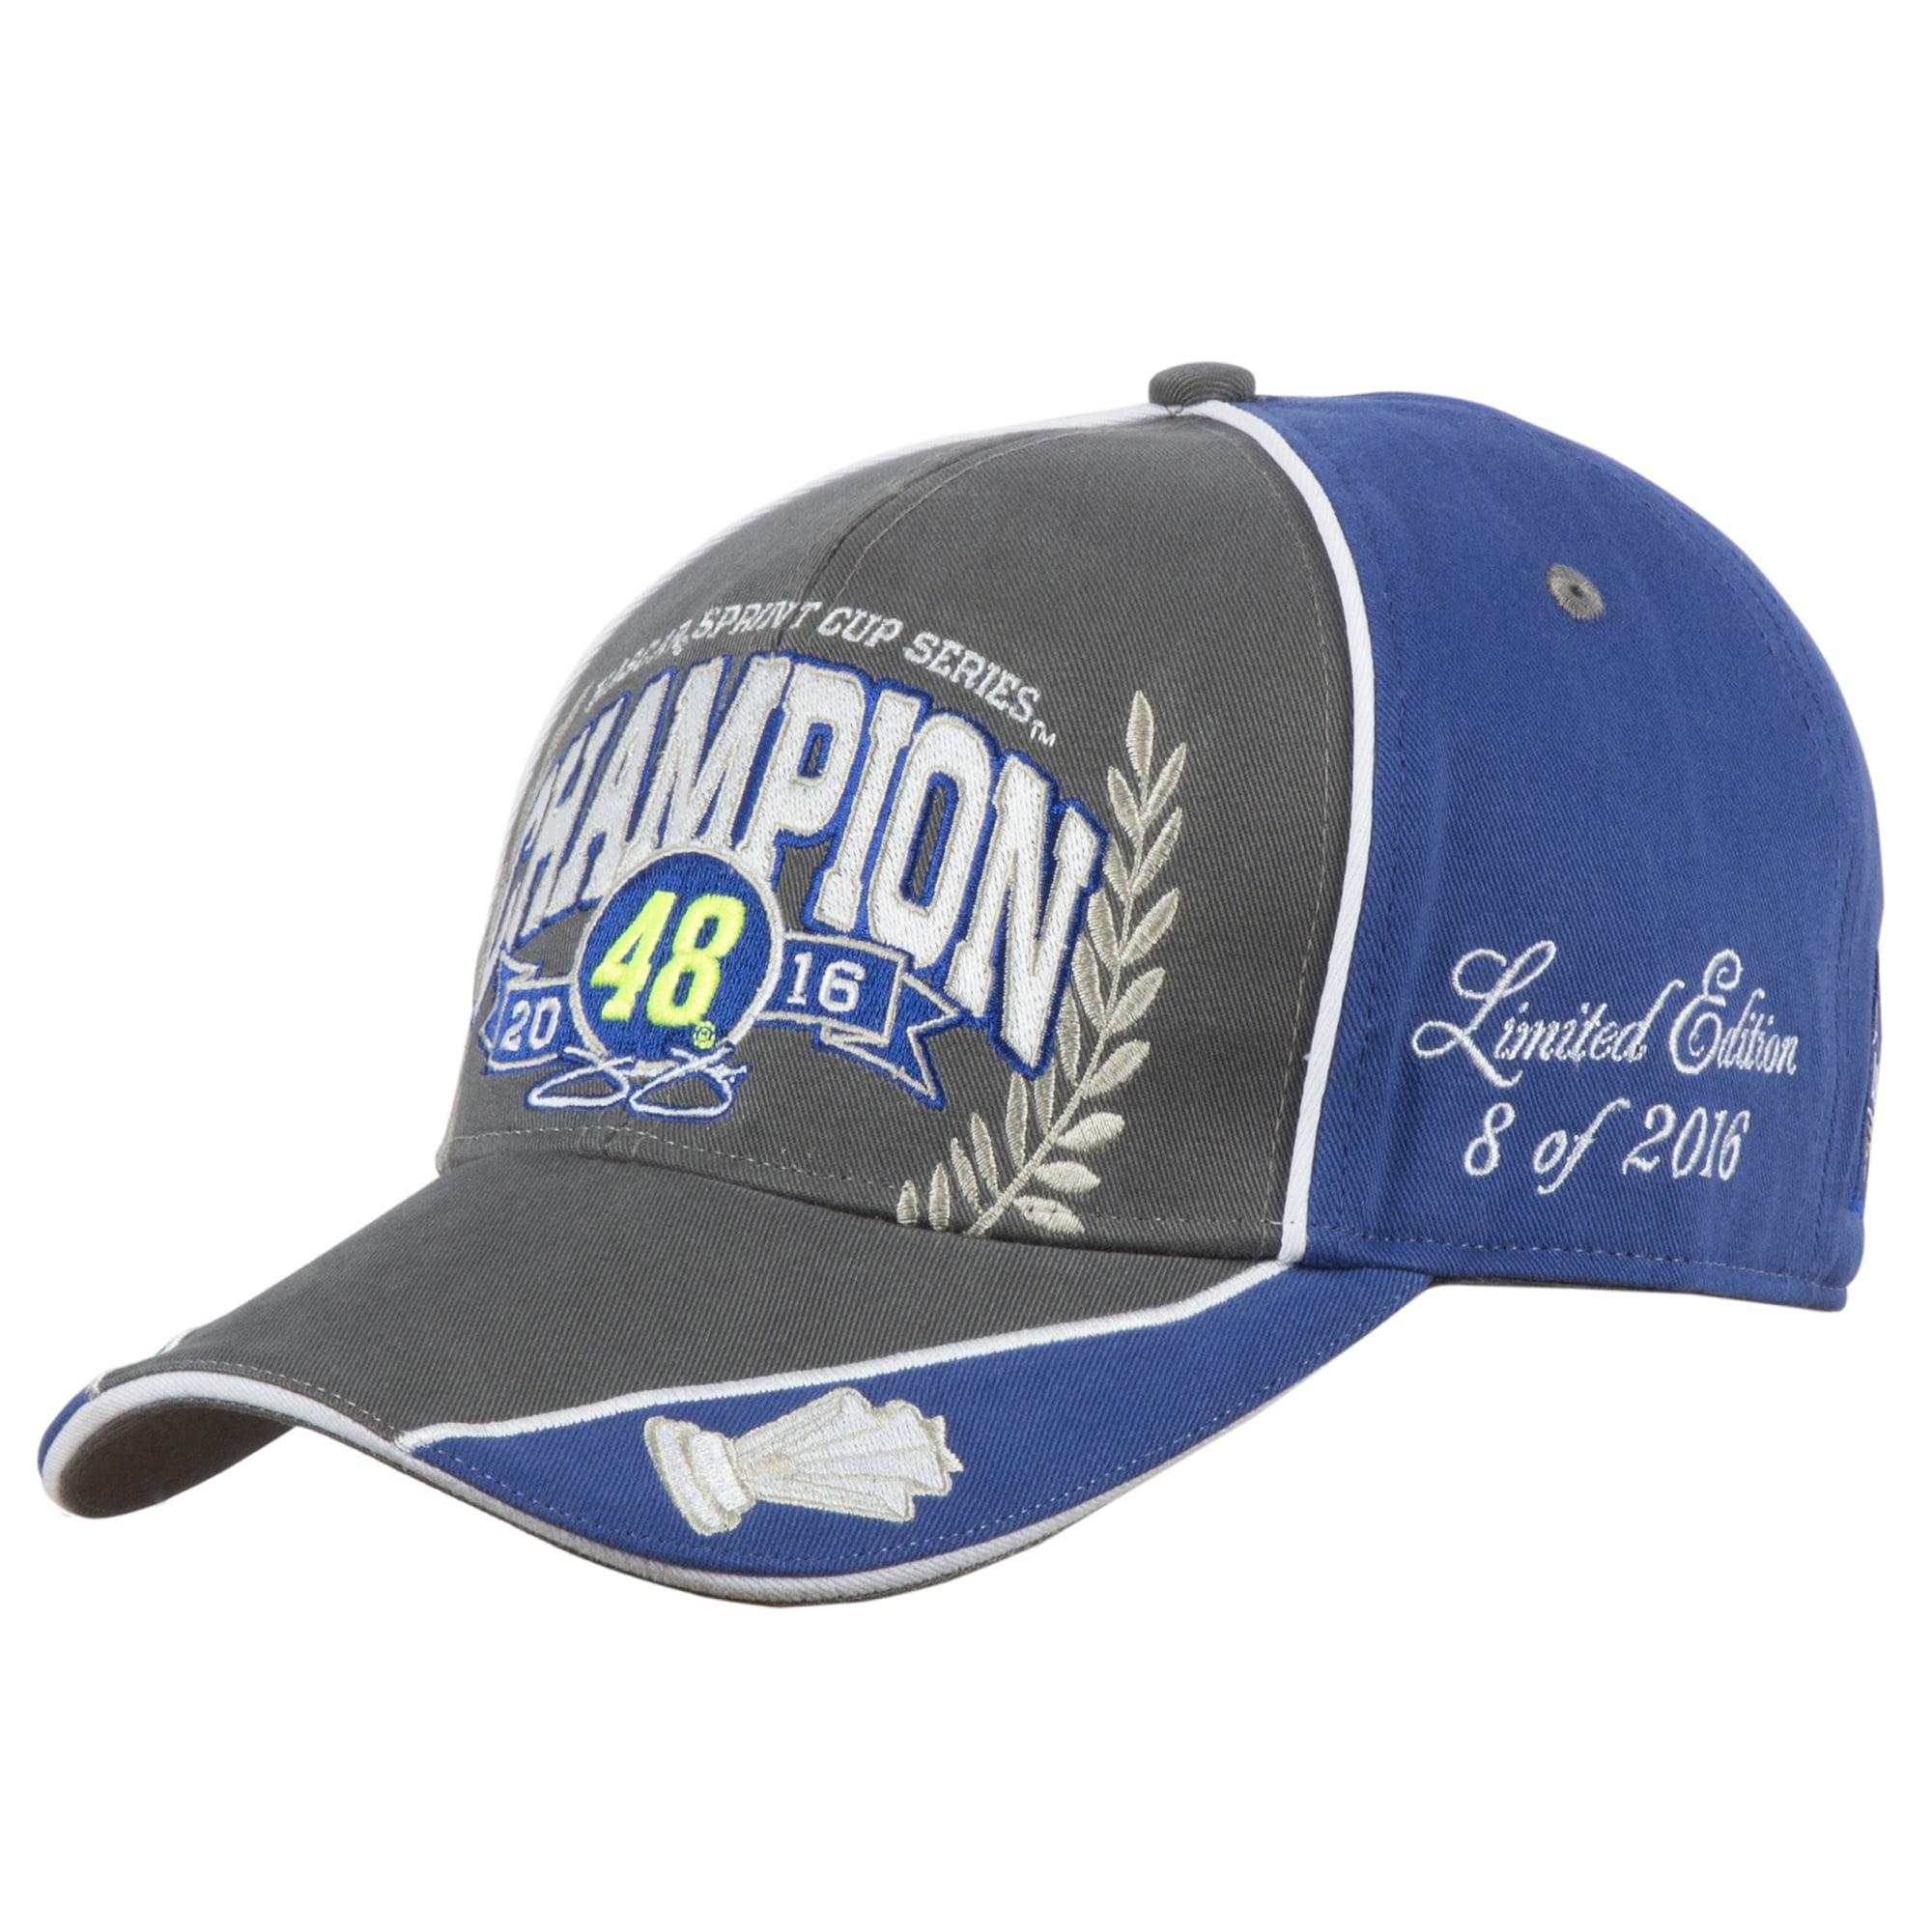 Jimmie Johnson 2016 Sprint Cup Champion Adjustable Hat - Charcoal - OSFA